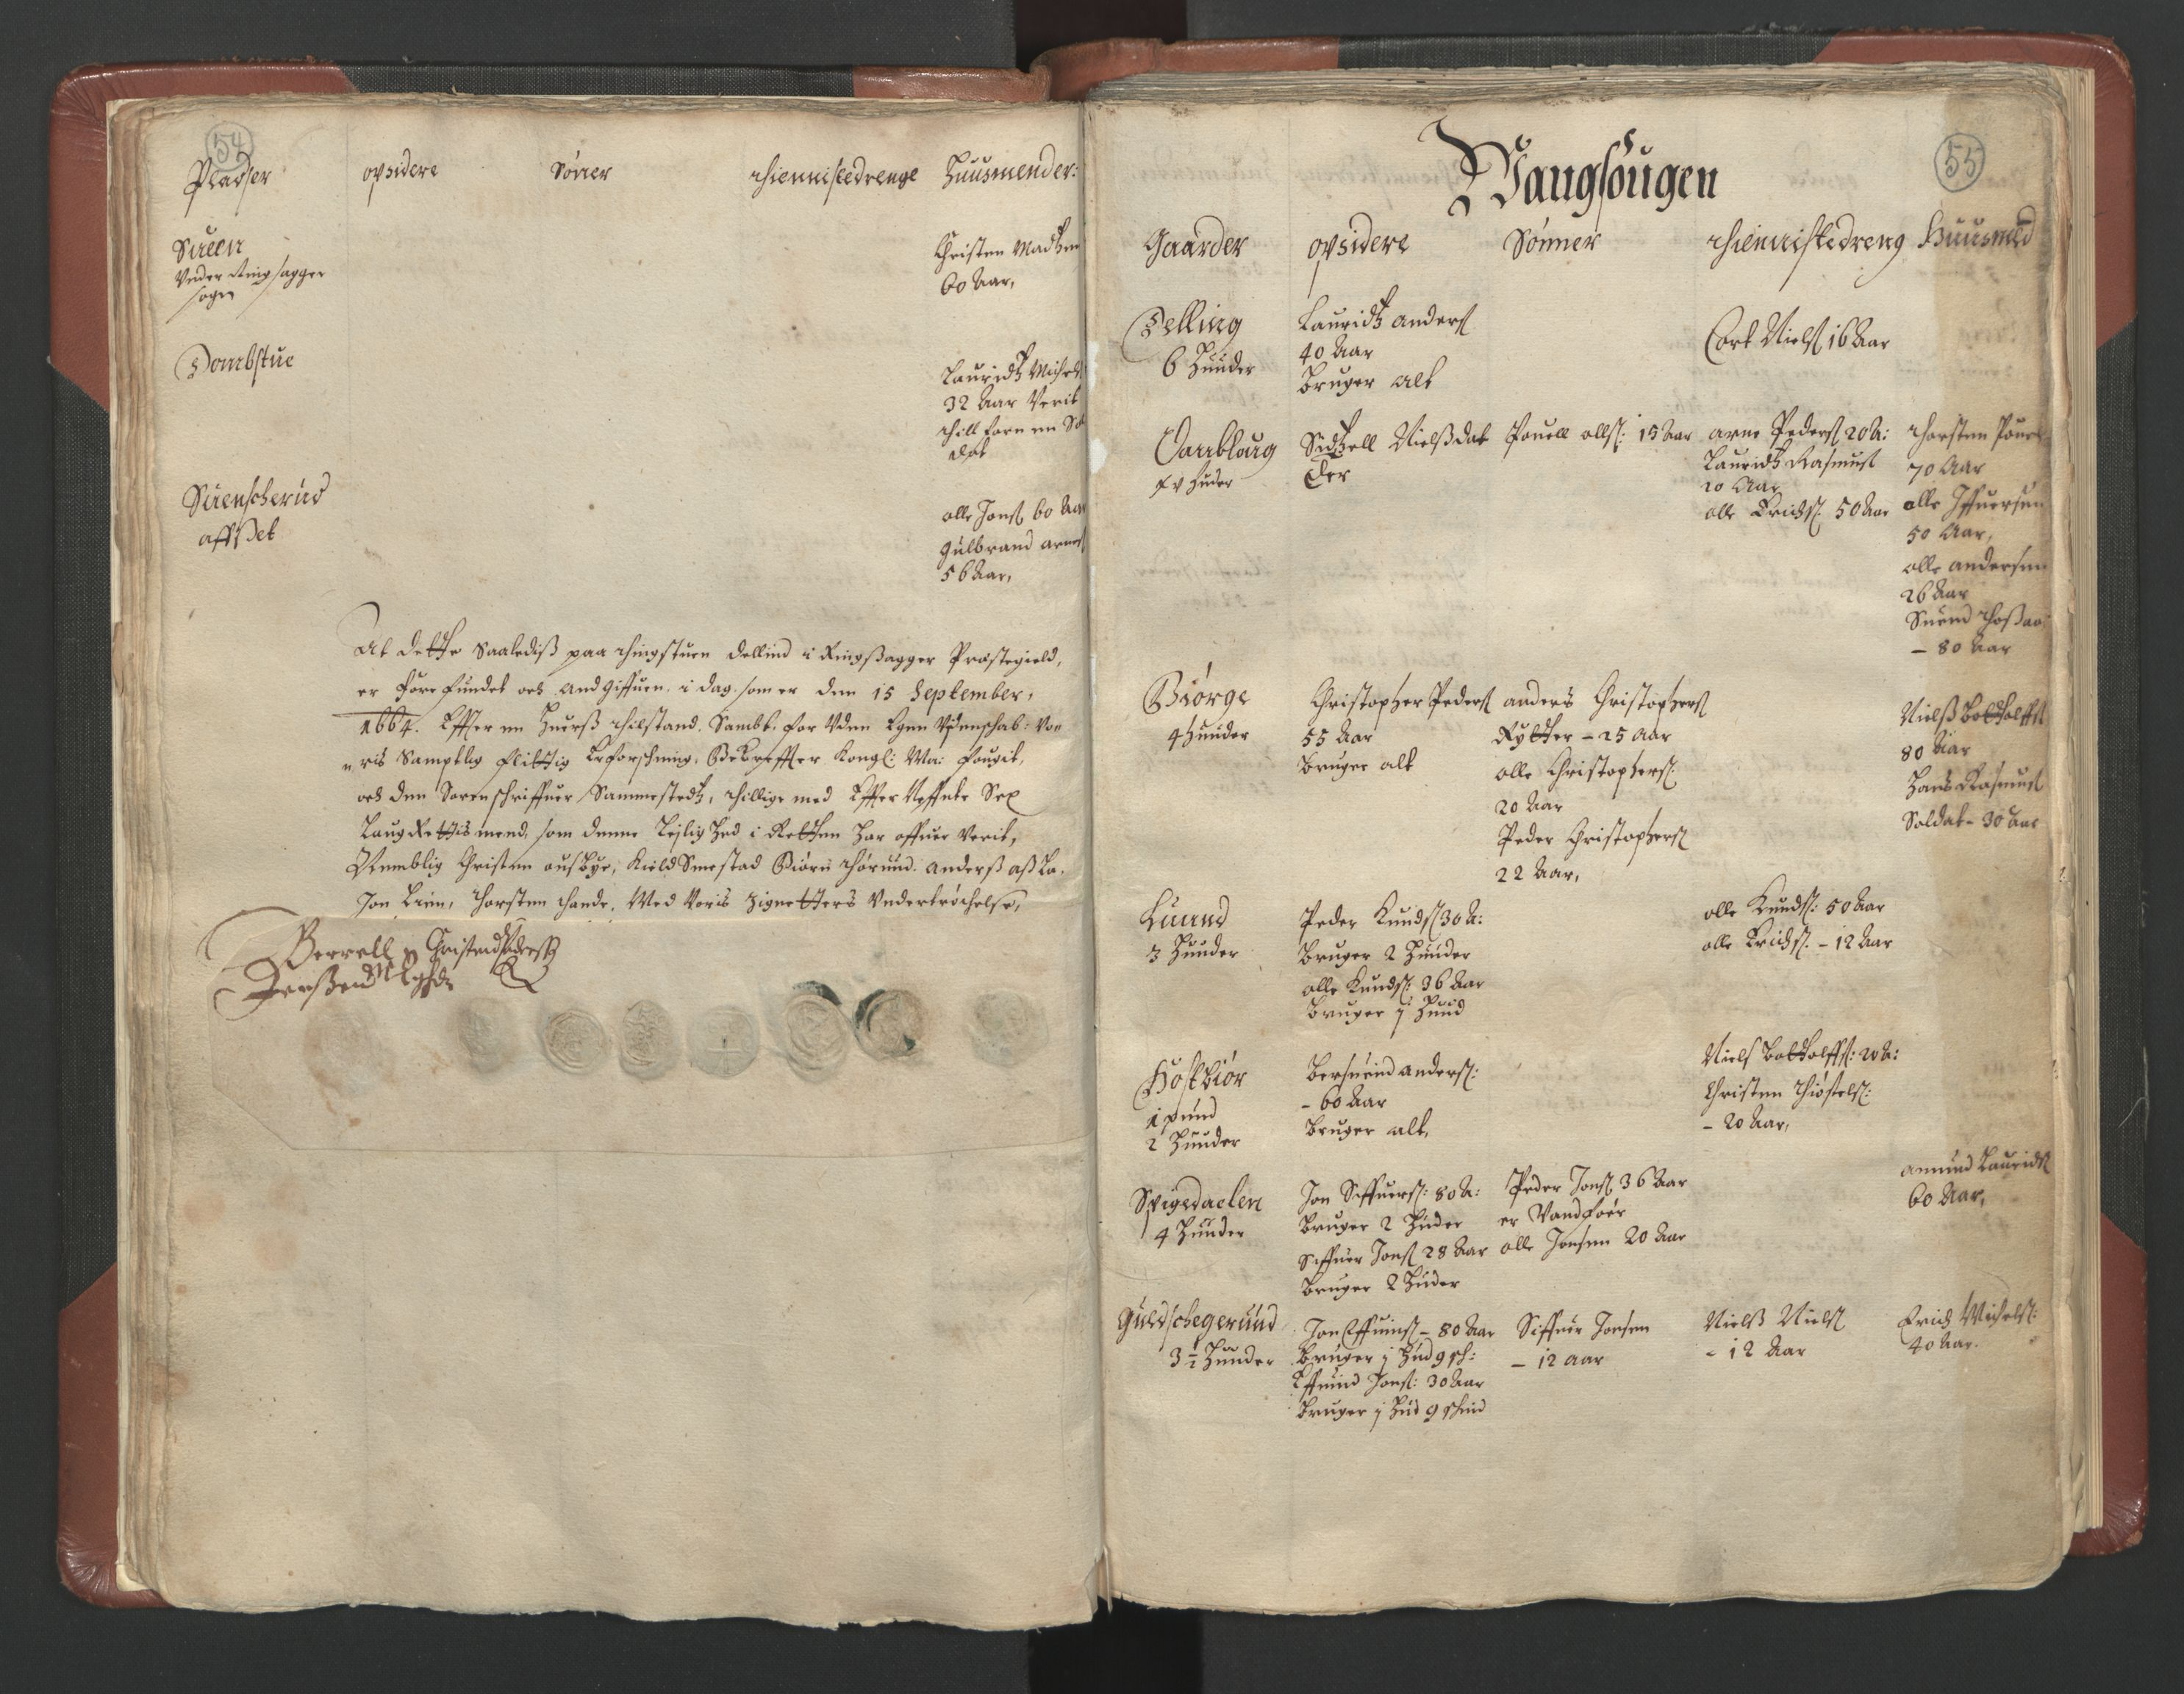 RA, Fogdenes og sorenskrivernes manntall 1664-1666, nr. 3: Hedmark fogderi og Solør, Østerdal og Odal fogderi, 1664, s. 54-55